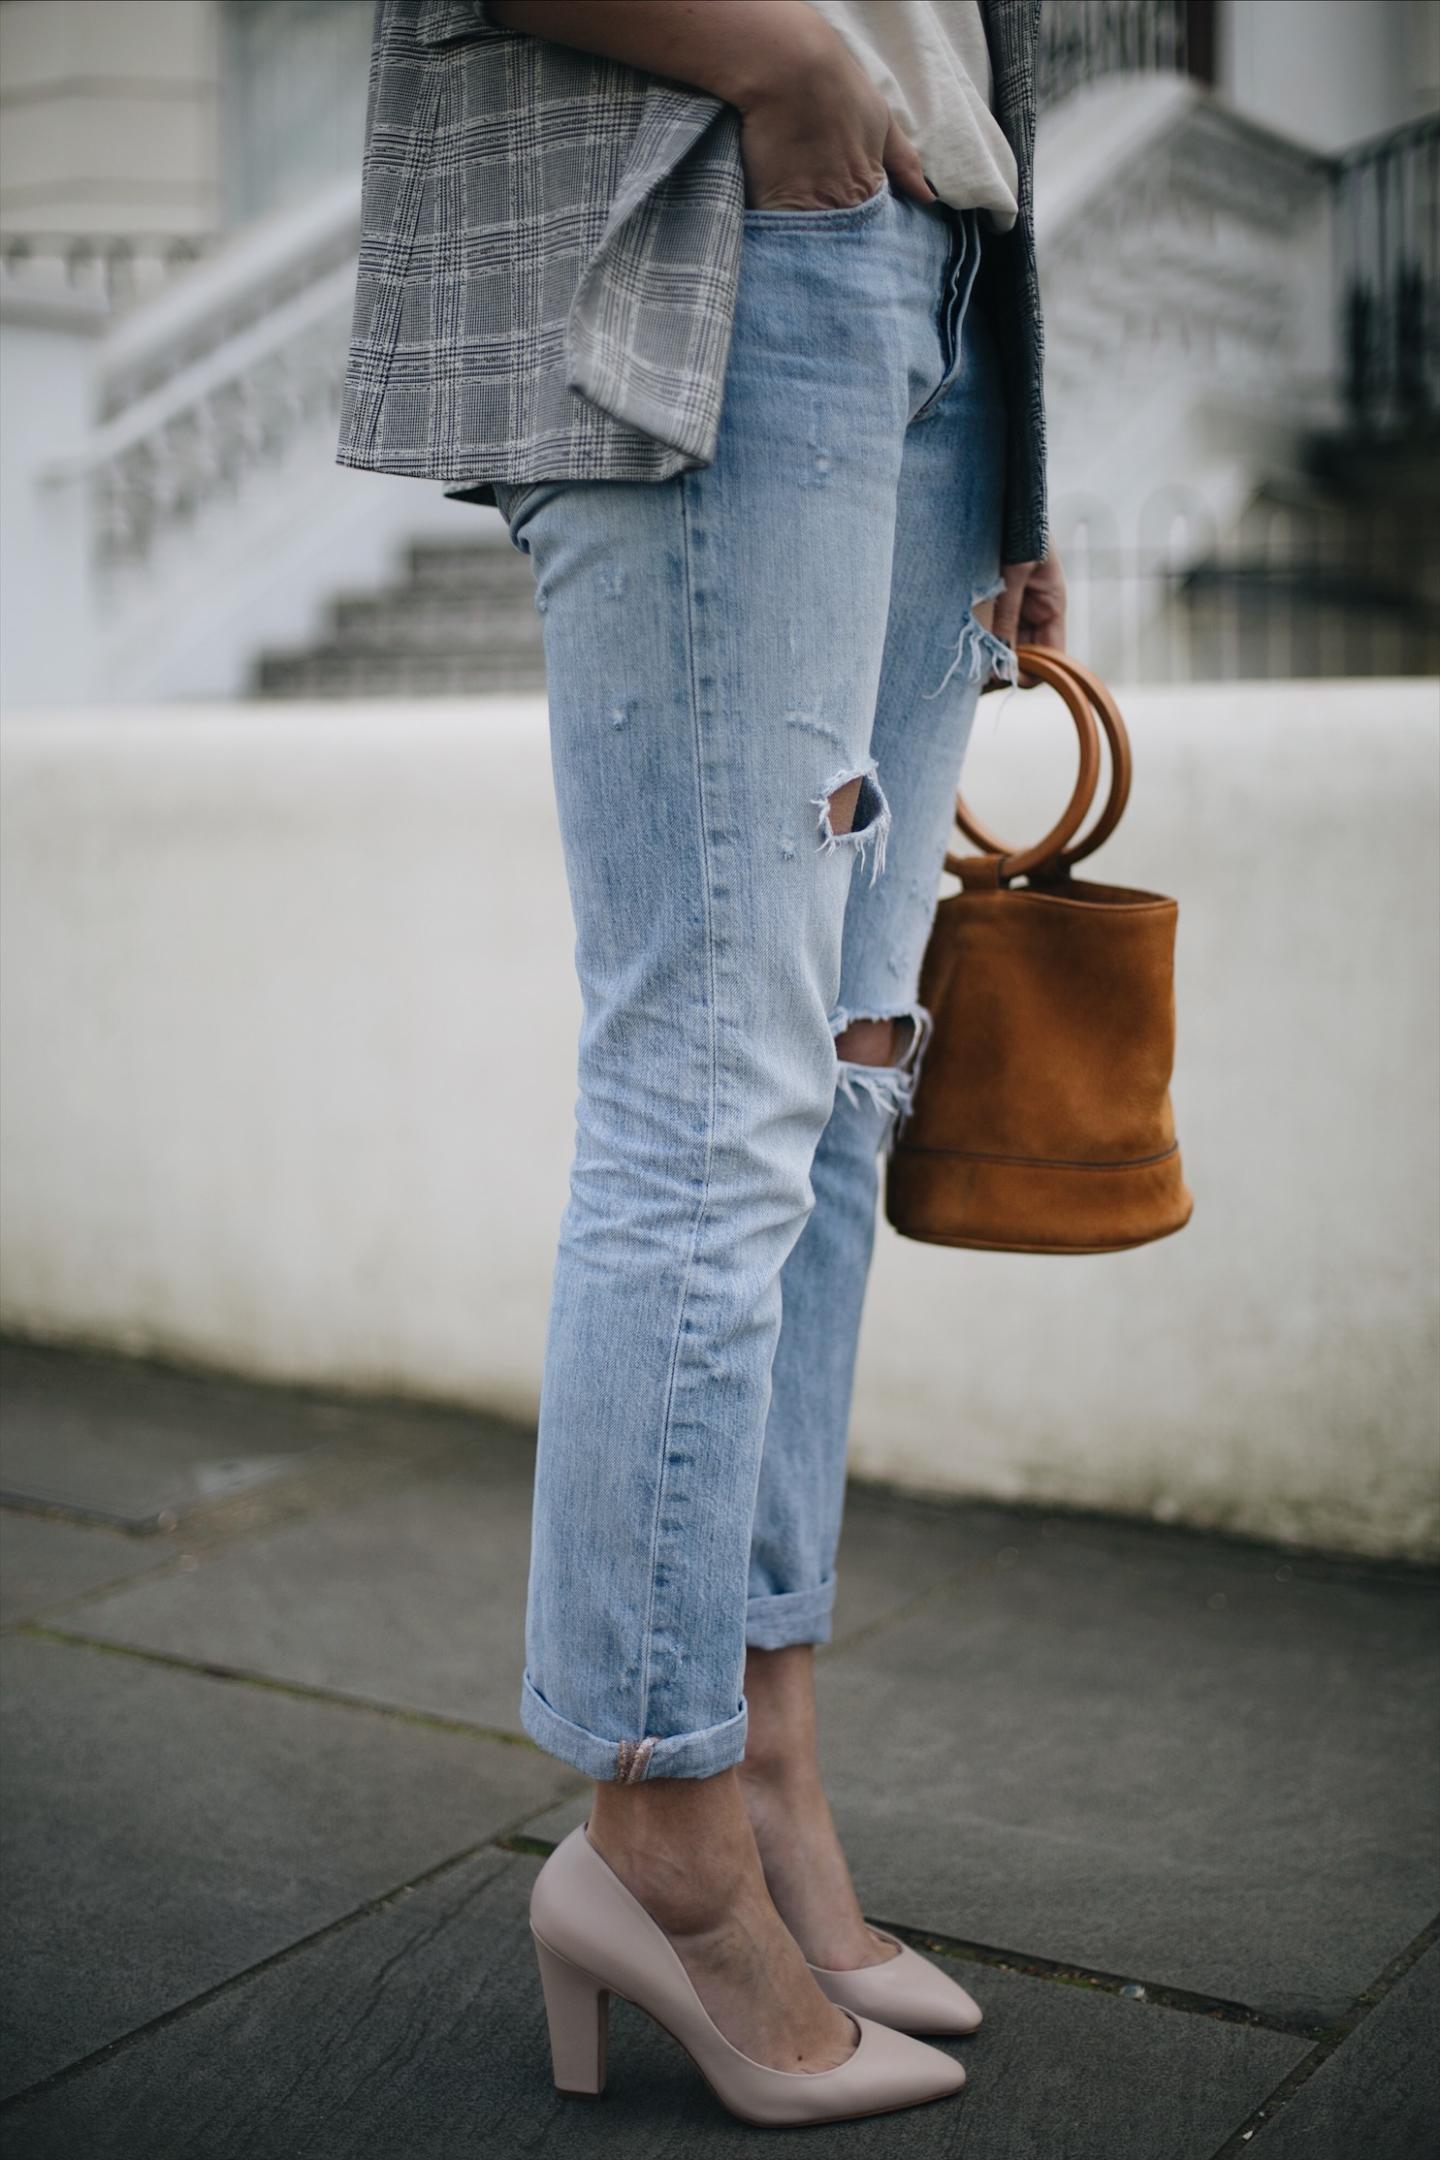 Emma Hill wears Dune x Rupert Sanderson cream leather 'Ella' heels, Levis 501 boyfriend ripped jeans, Isabel Marant Endless t-shirt, check blazer, Simon Miller tan nubuck suede ring handle 'Bonsai' bag